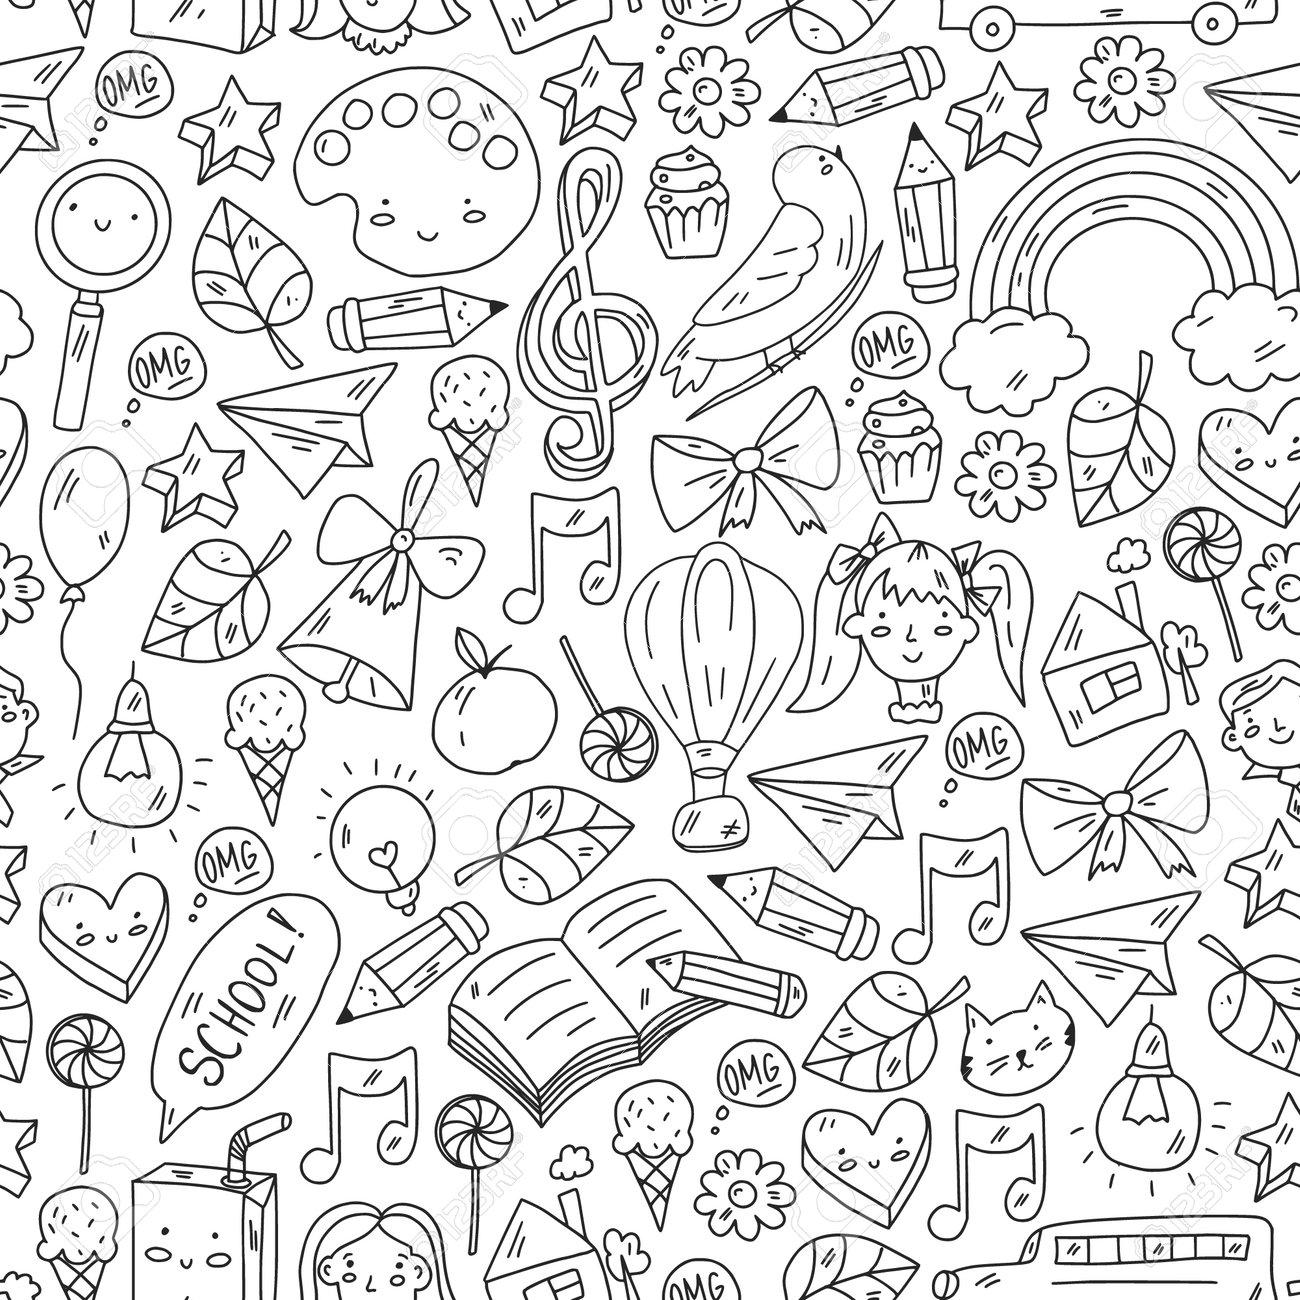 School, kindergarten with cute vector children. Creativity and imagination. Dancing, singing, painting, online education. - 173370226